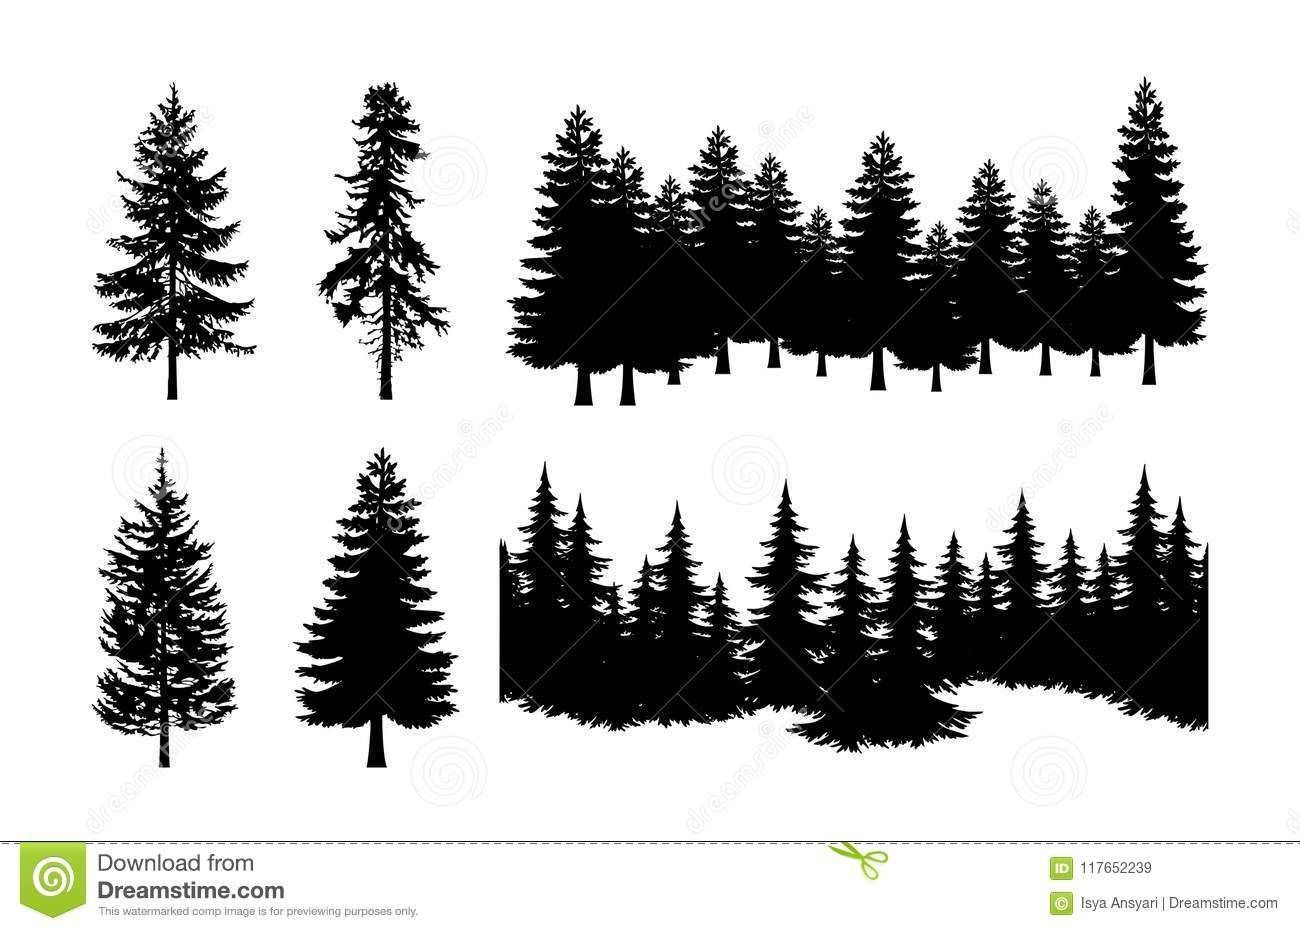 Https Www Dreamstime Com Mrisyaansyari Portfolio Pg1 Res22187011 Forest Silhouette Pine Tree Silhouette Tree Silhouette